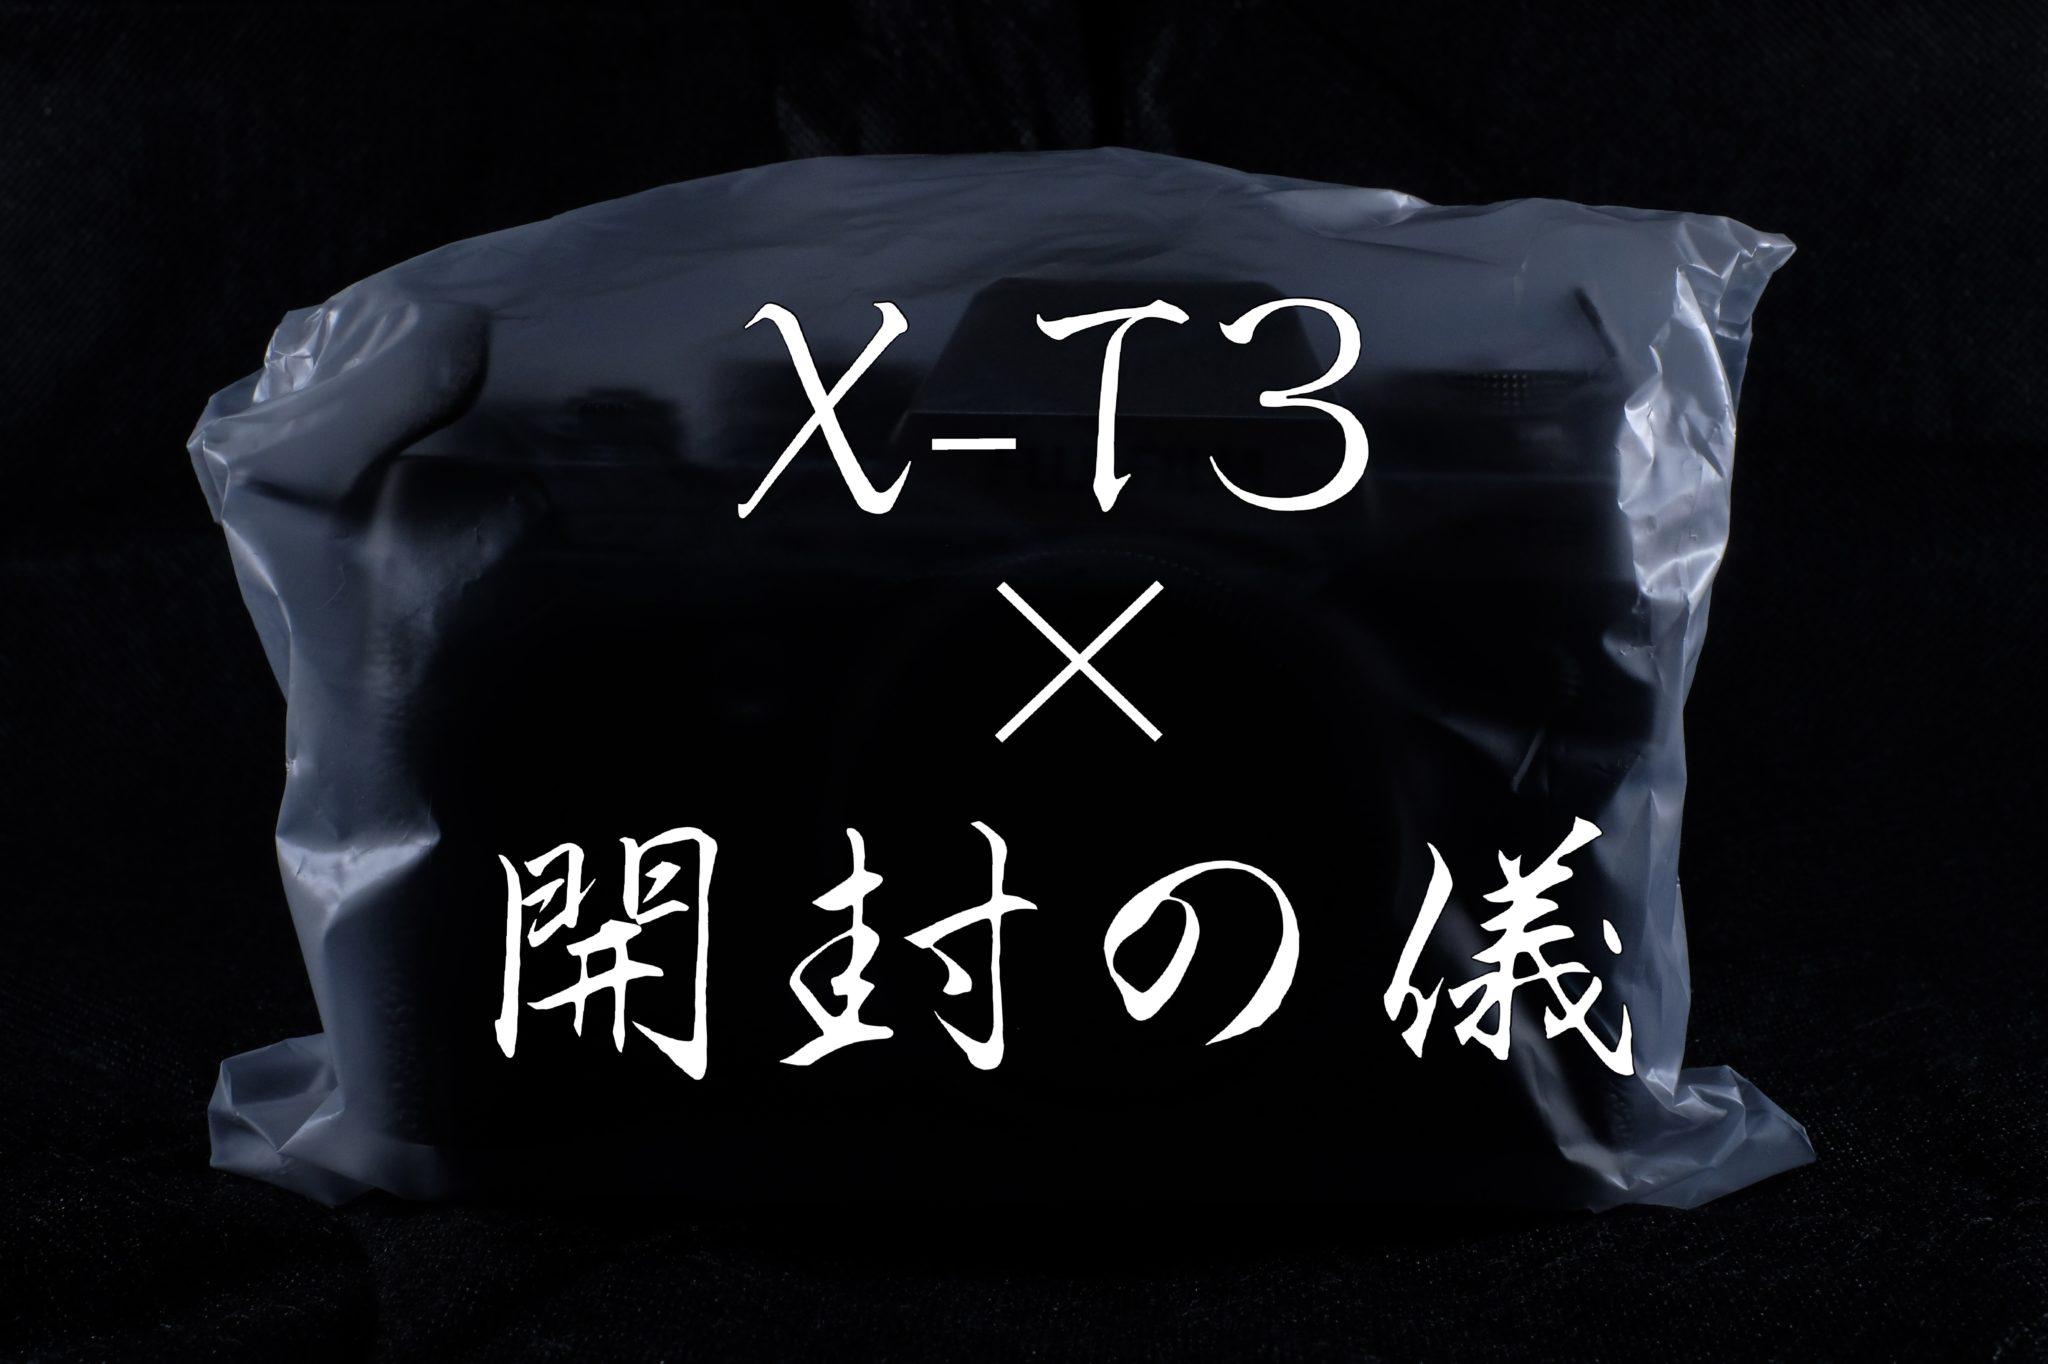 【FUJIFILM X-T3】開封の儀を執り行いました。